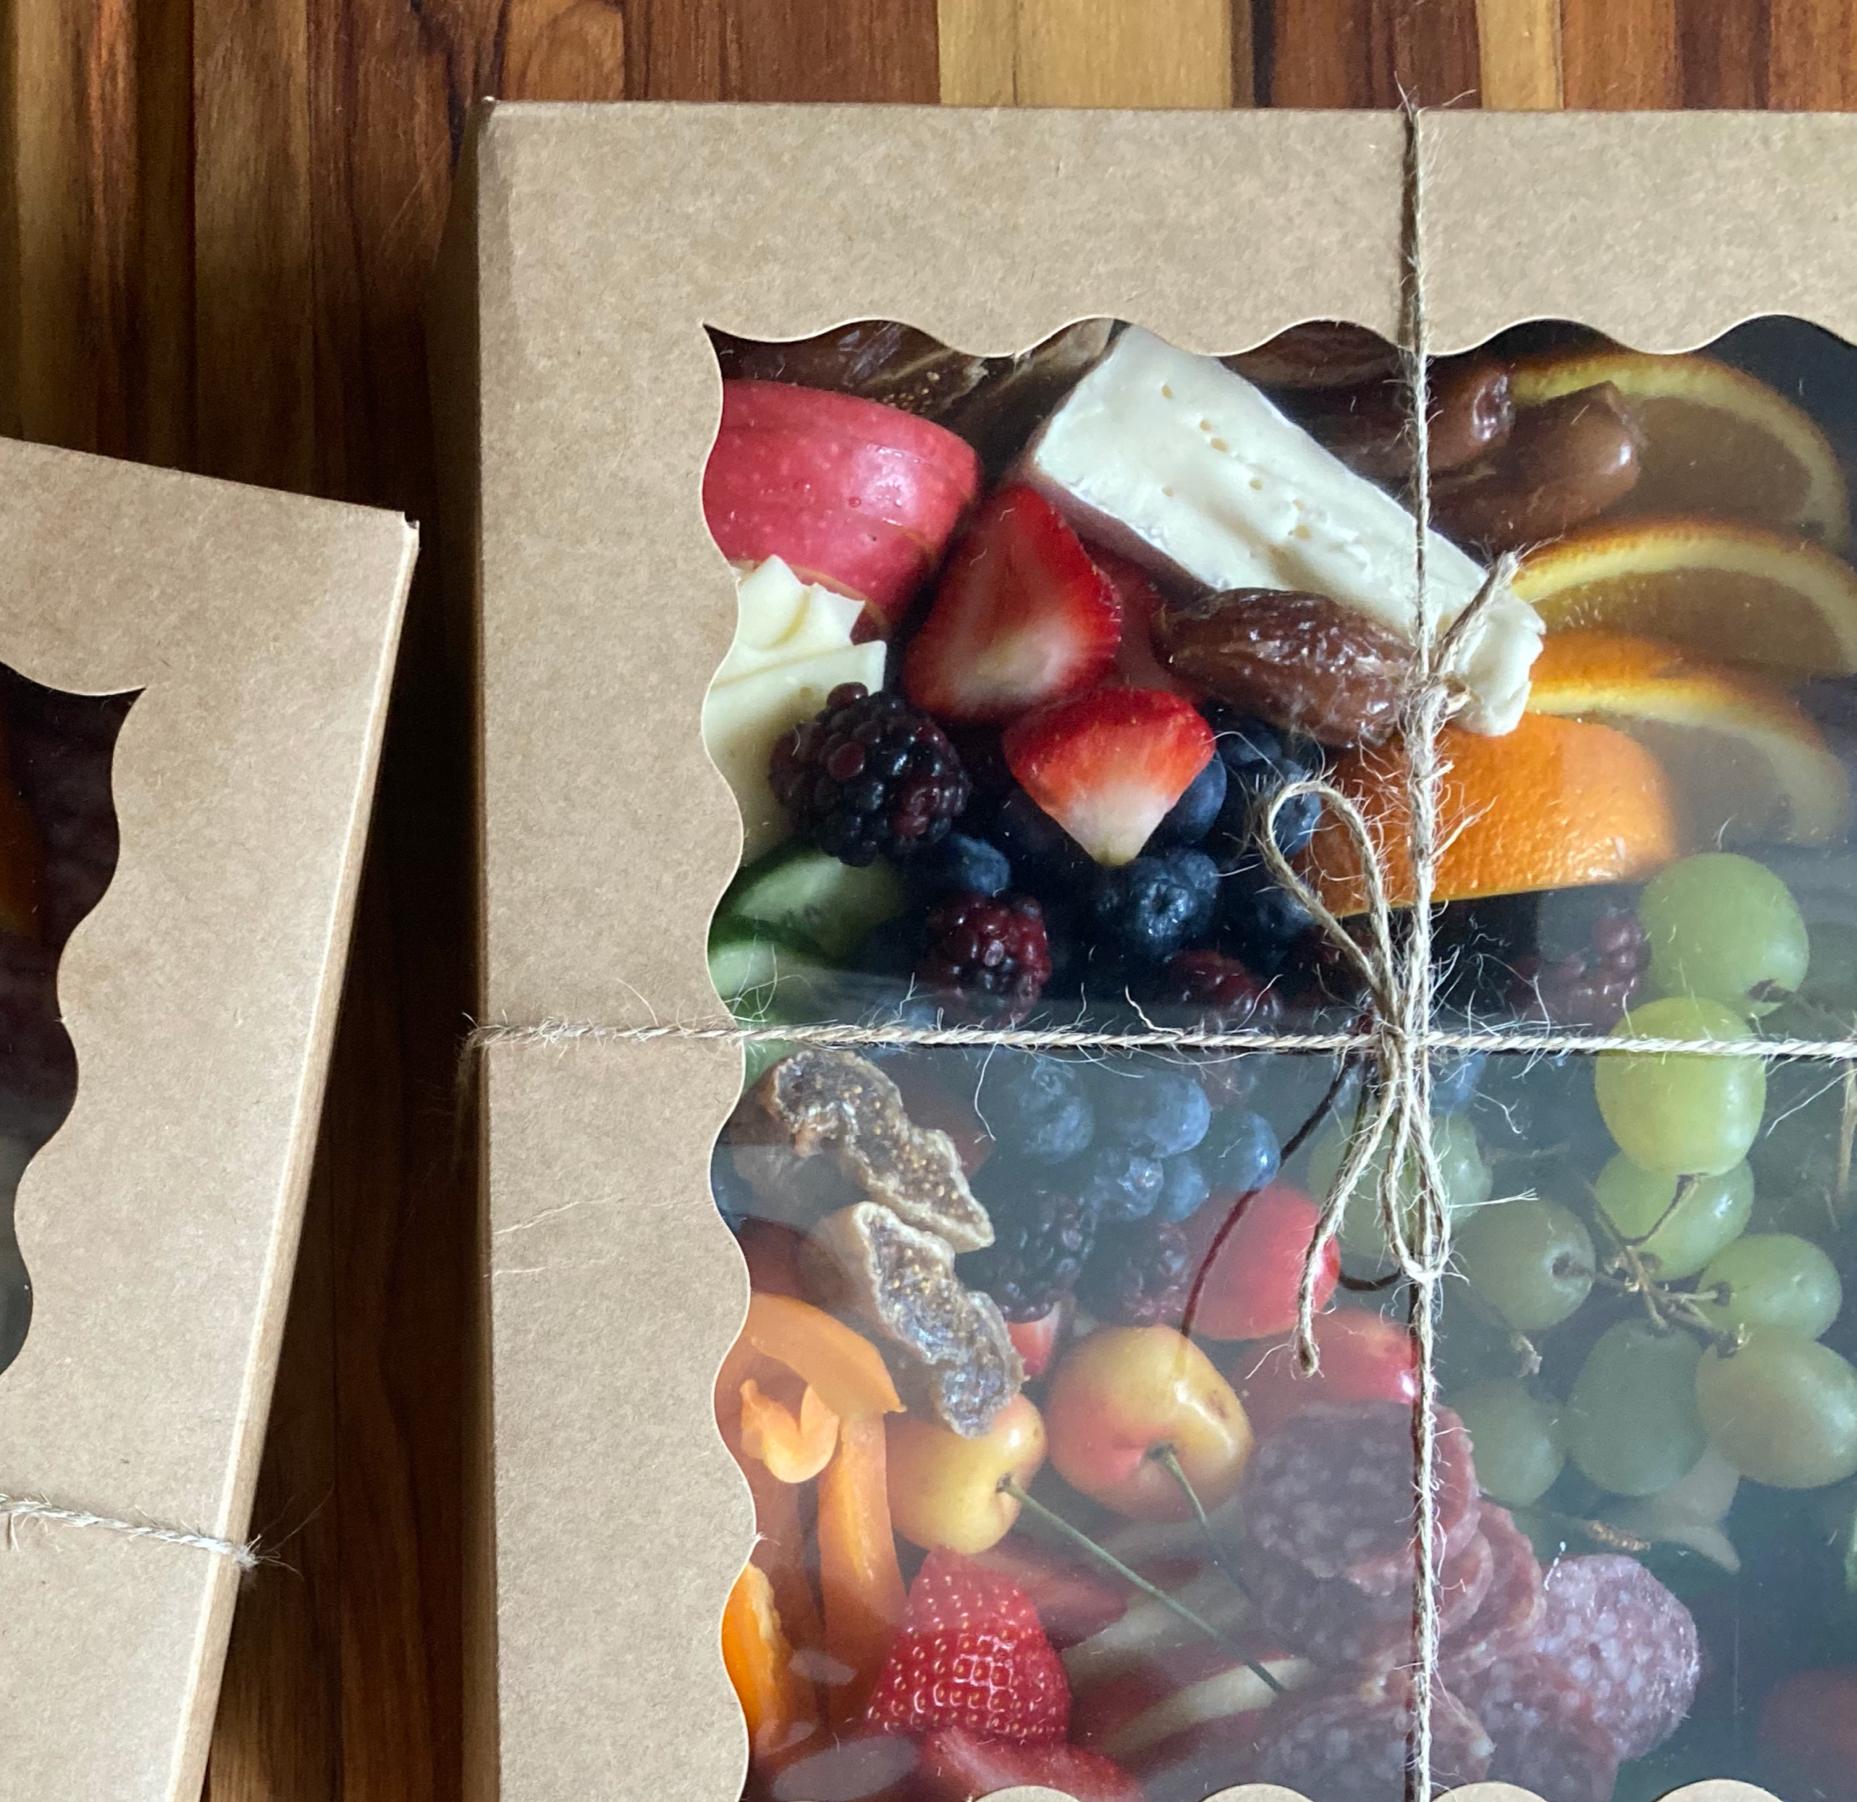 DIY Picnic in a box